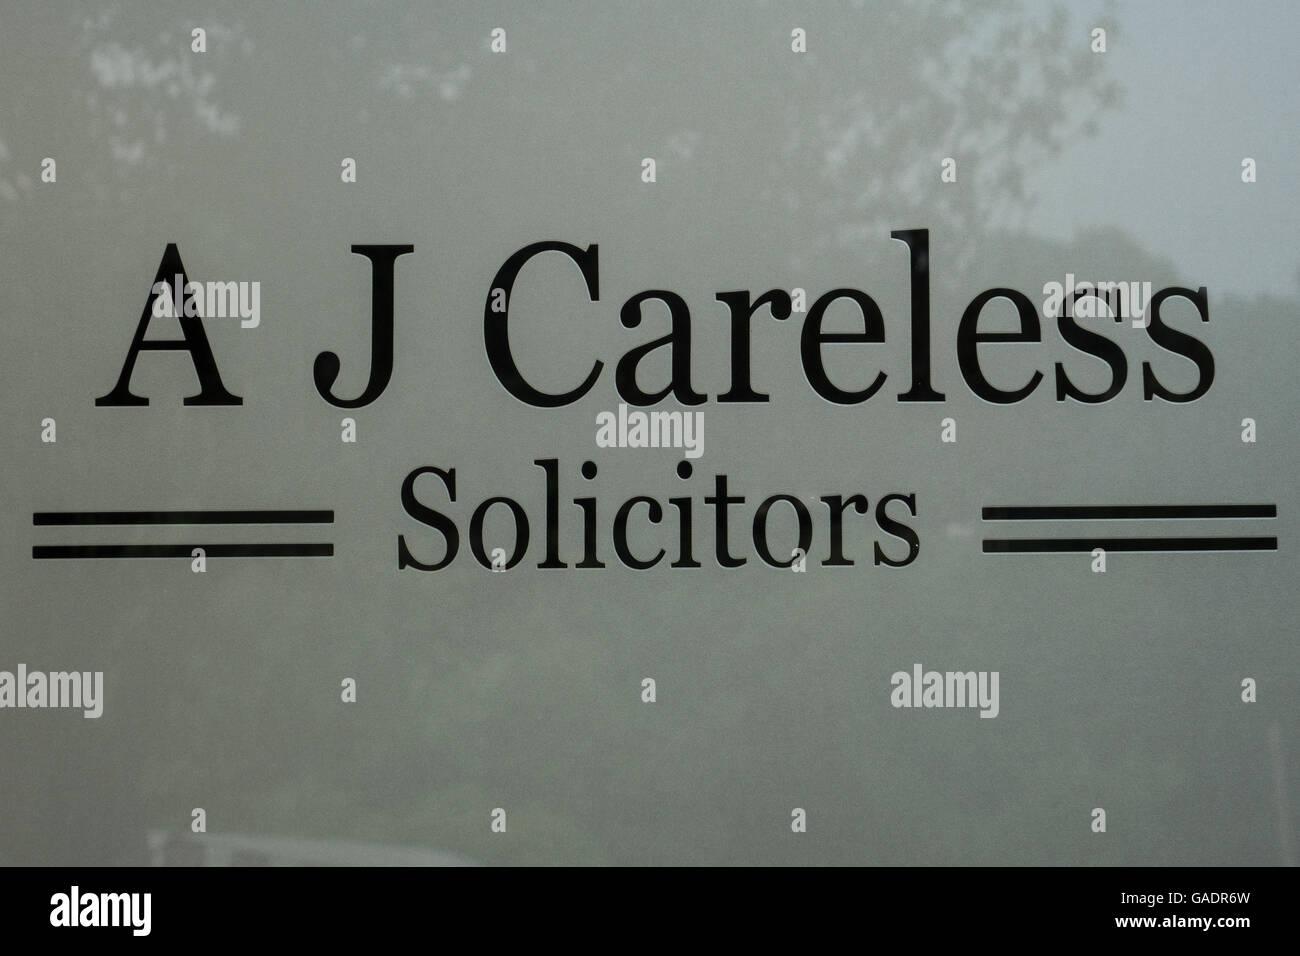 Careless Solicitors, Amusing name - Stock Image